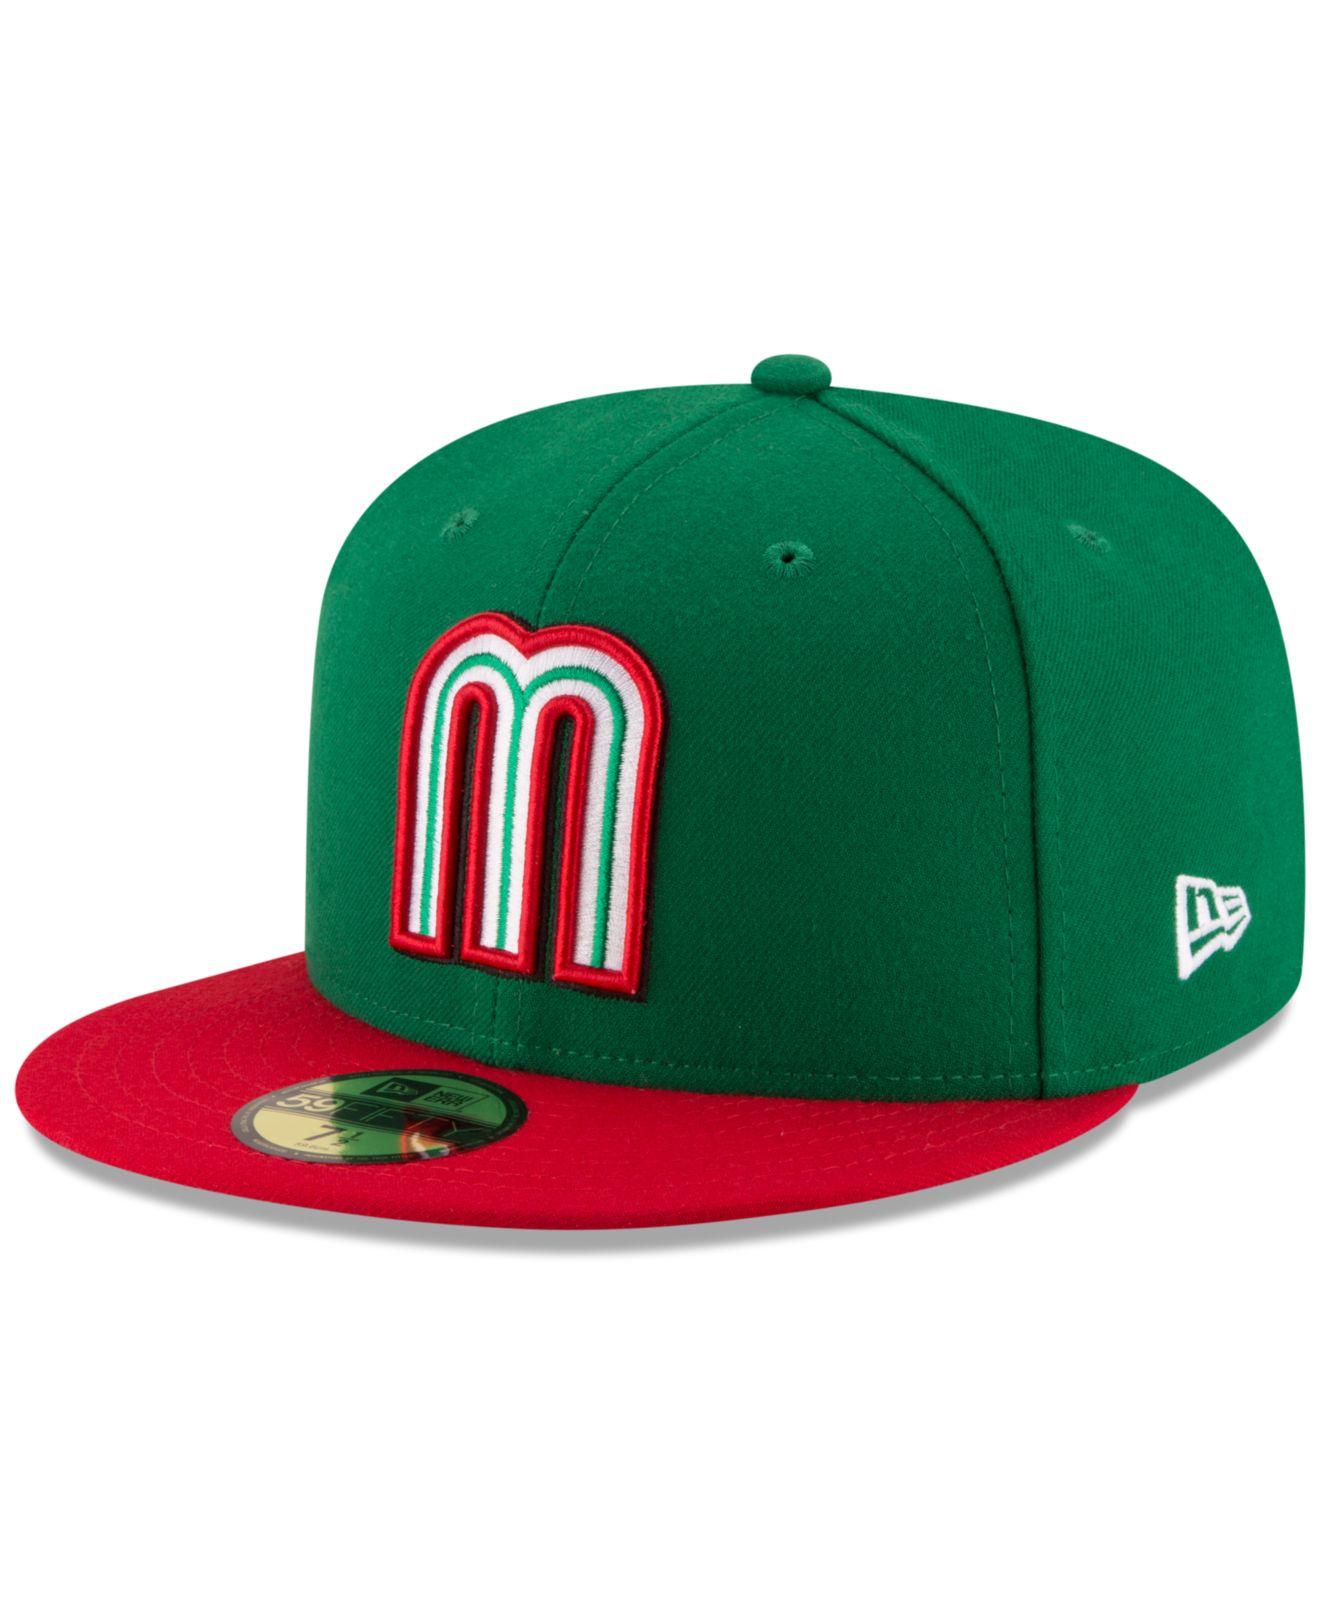 ktz mexico 2017 world baseball classic 59fifty cap in